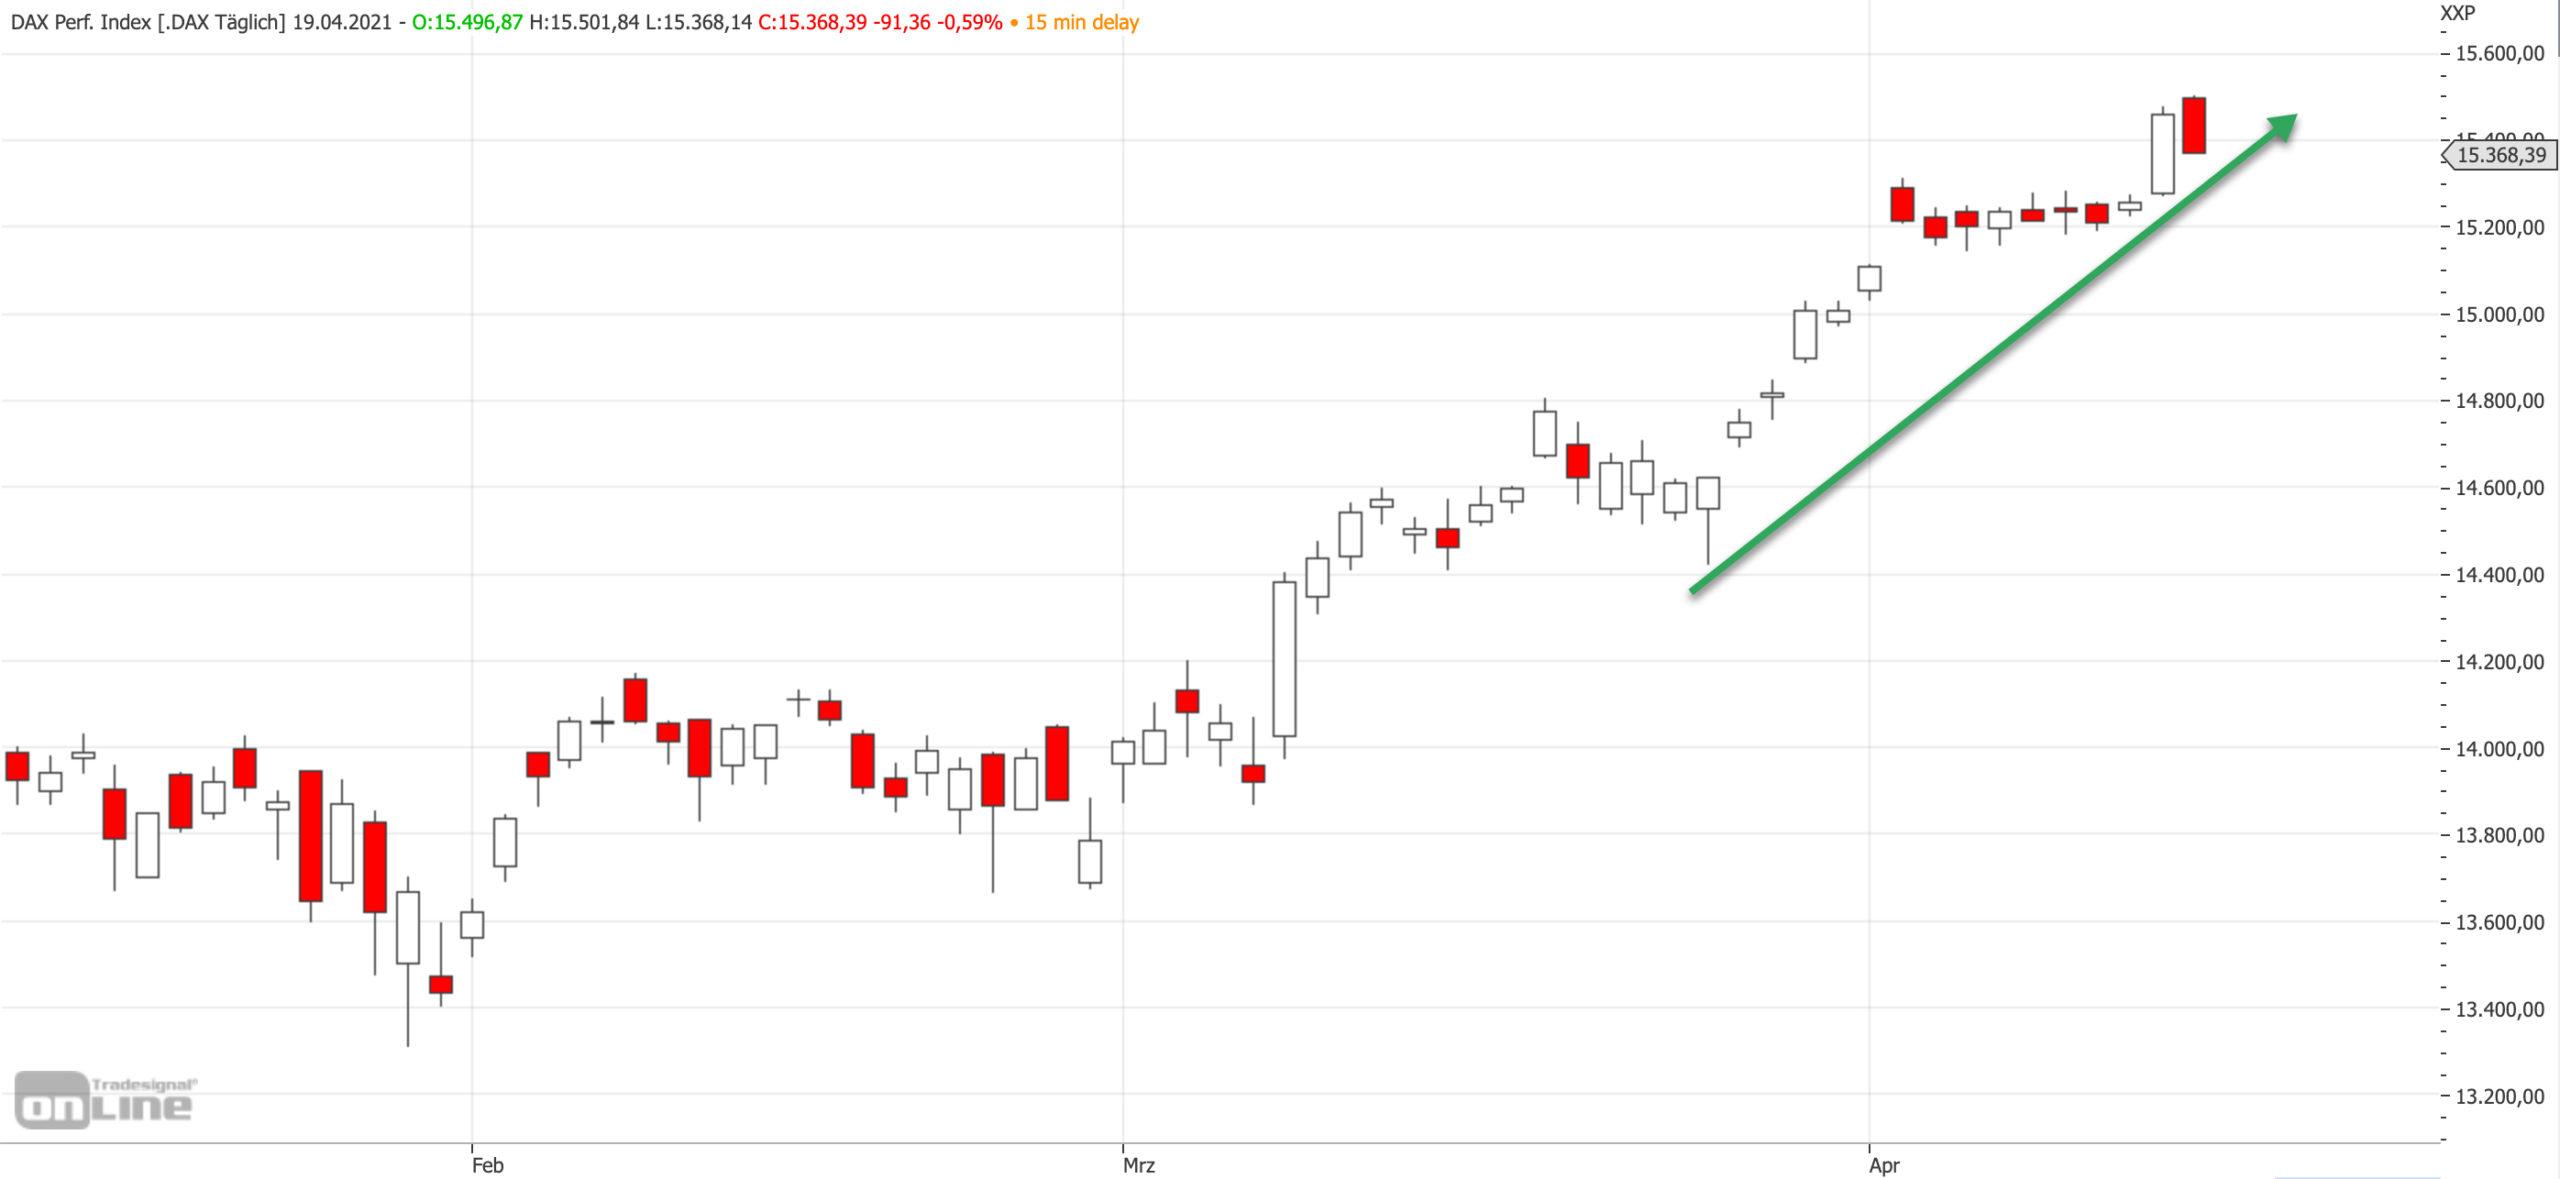 Mittelfristiger DAX-Chart am 19.04.2021